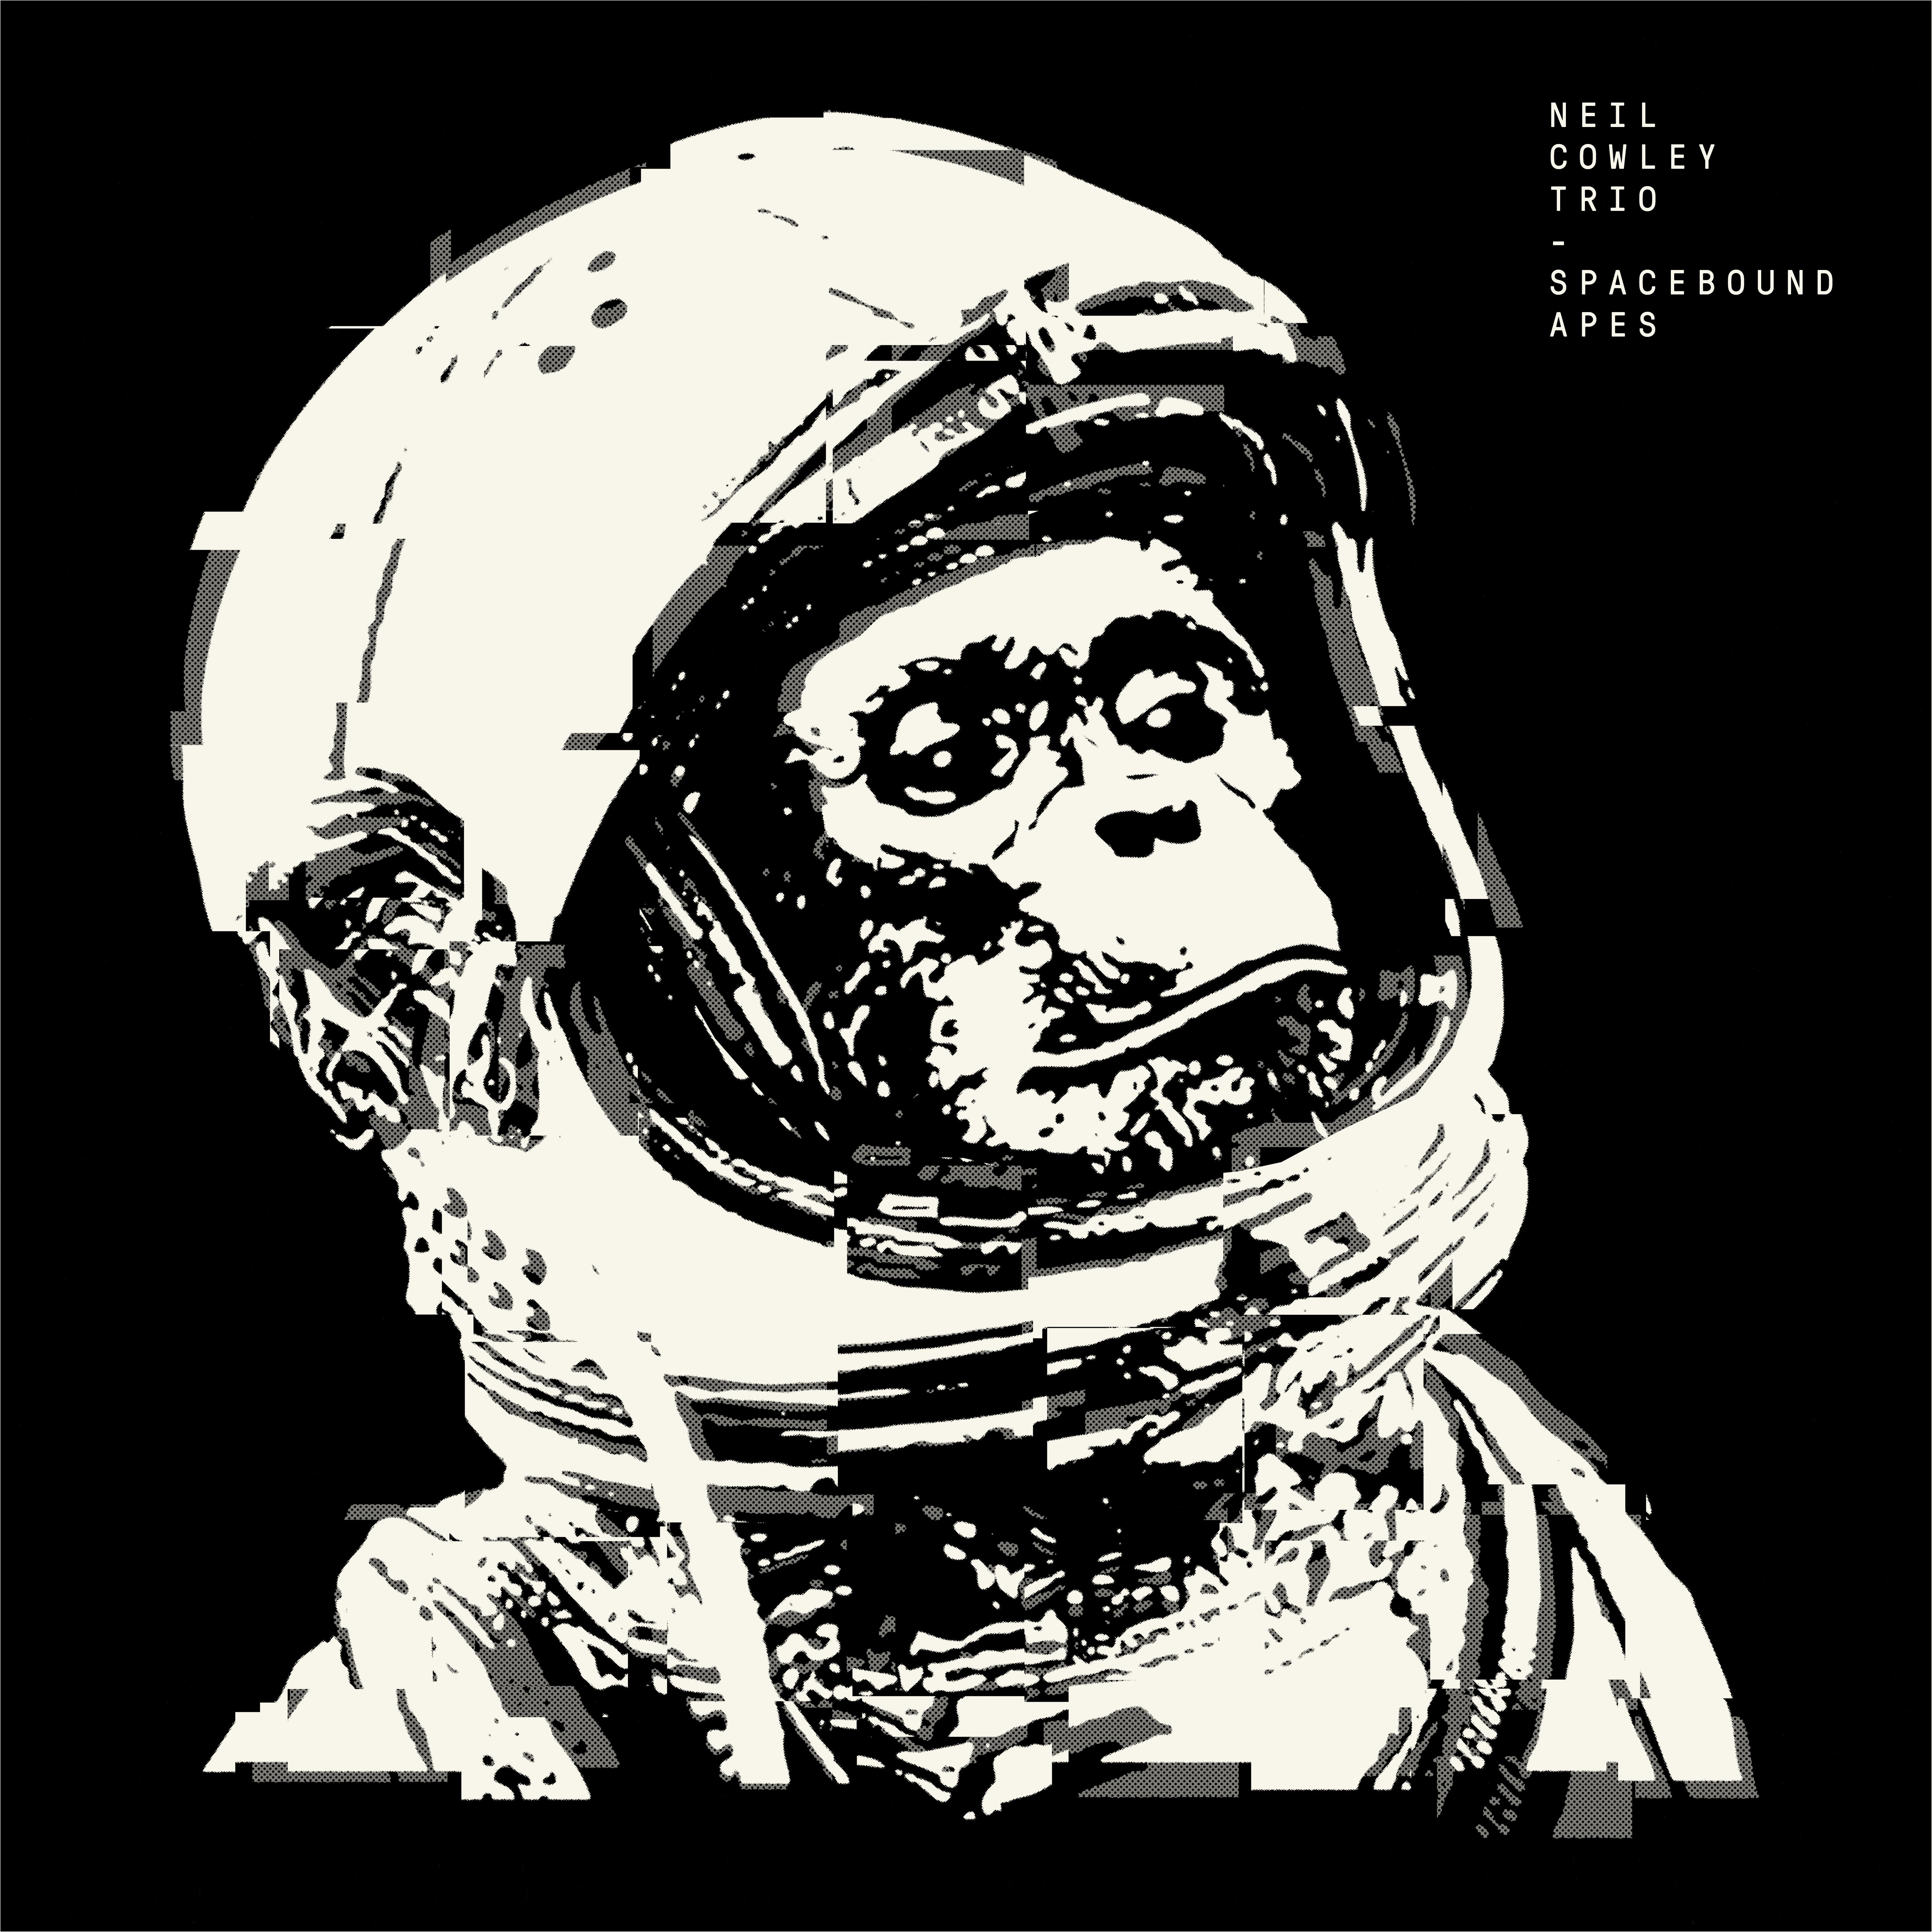 Spacebound Apes CD